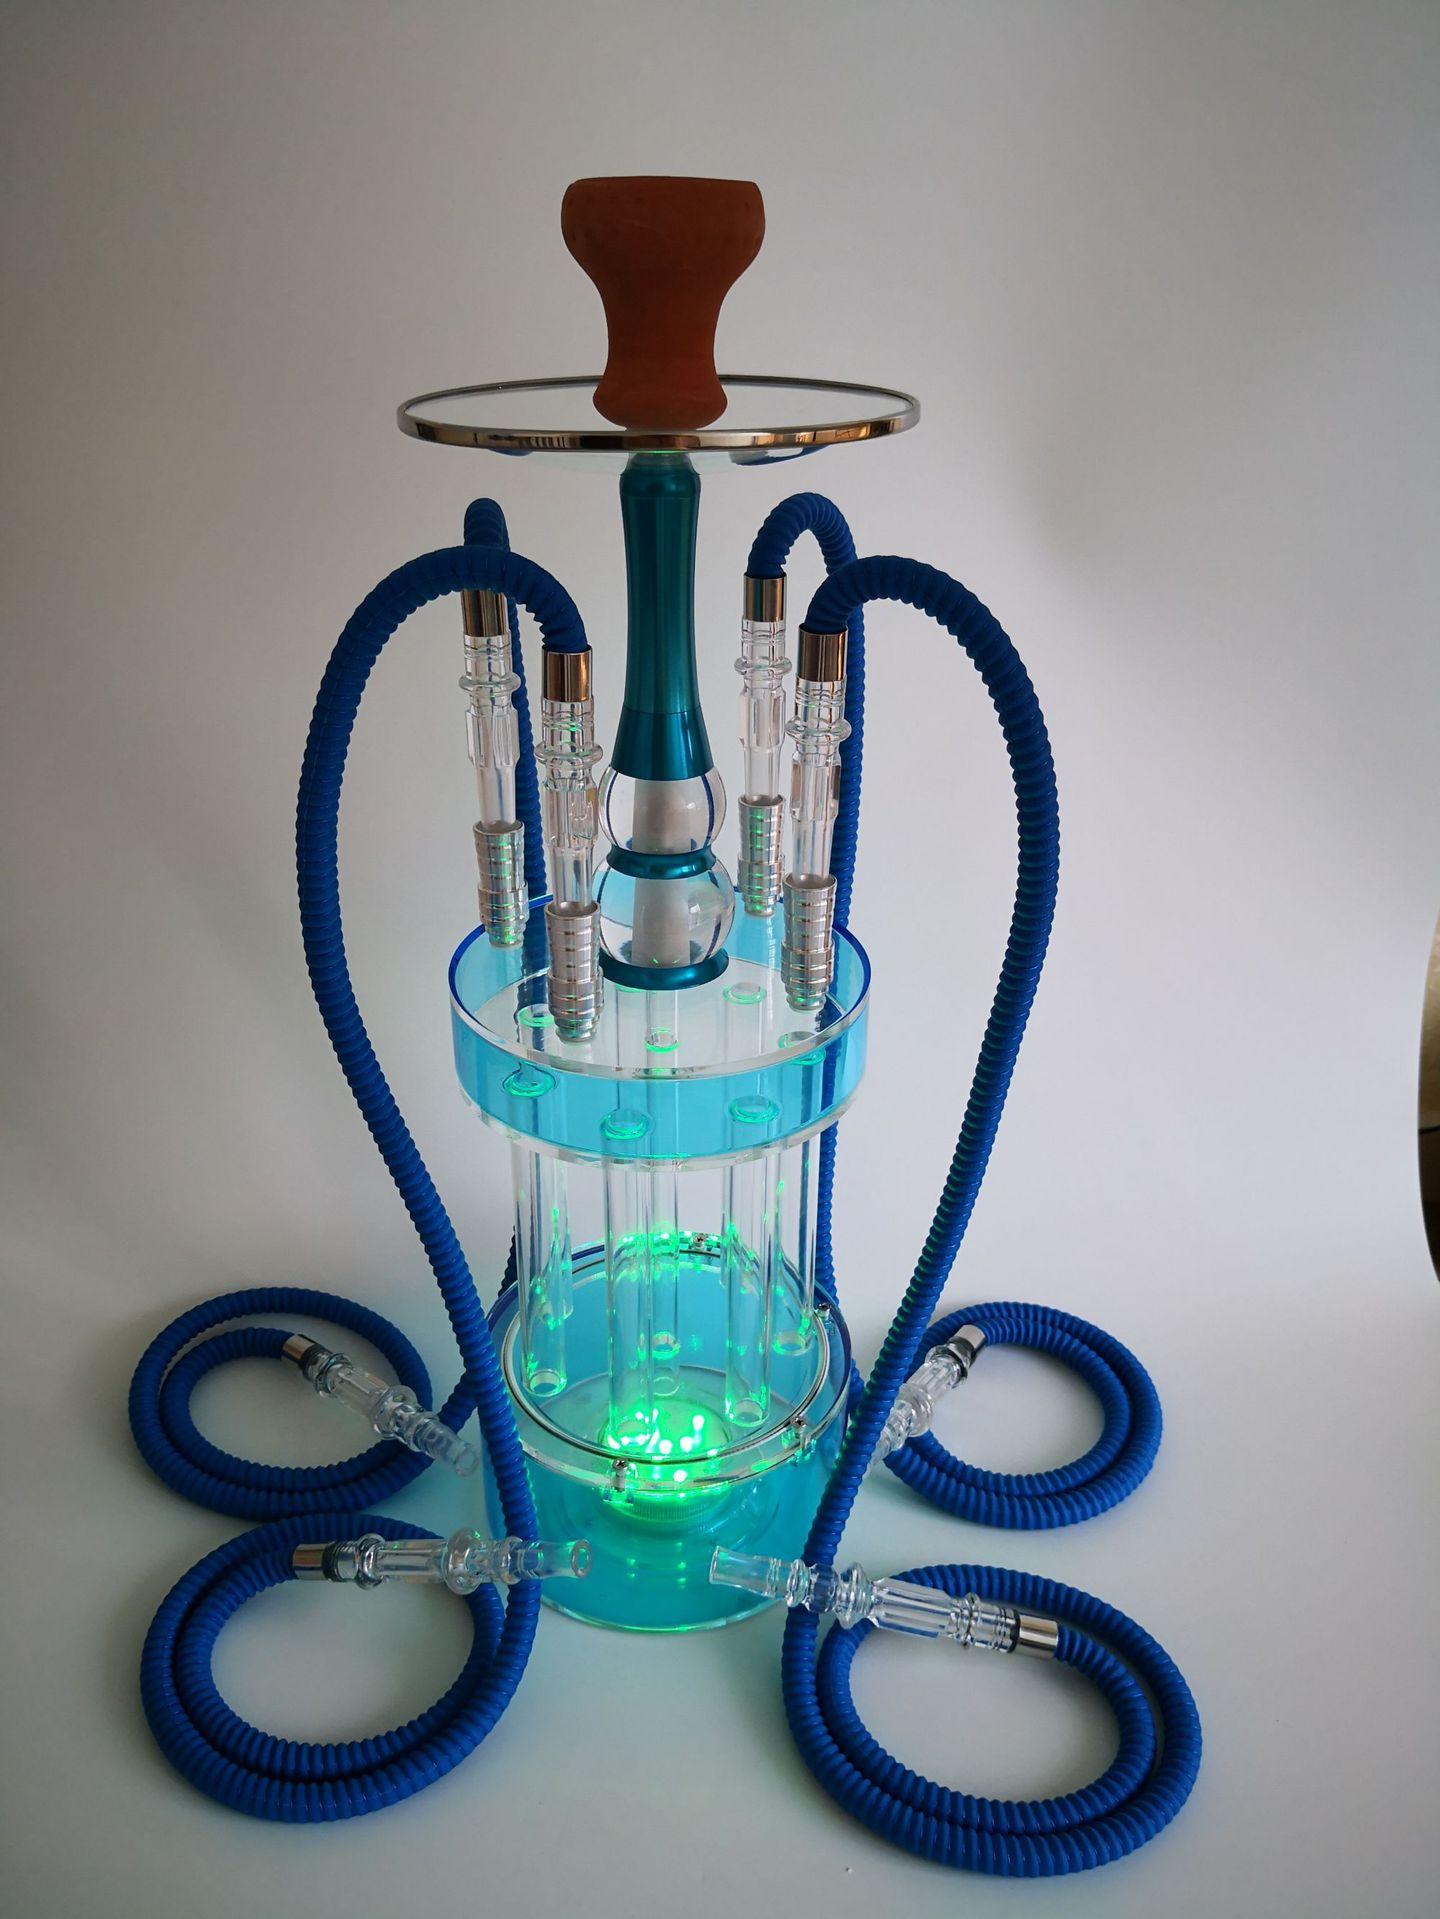 new Products Arab Hookah Four hoses with LED LightS shisha Nargile Shisha Hookah Set Accessories  Bar party gift Multiplayer enlarge